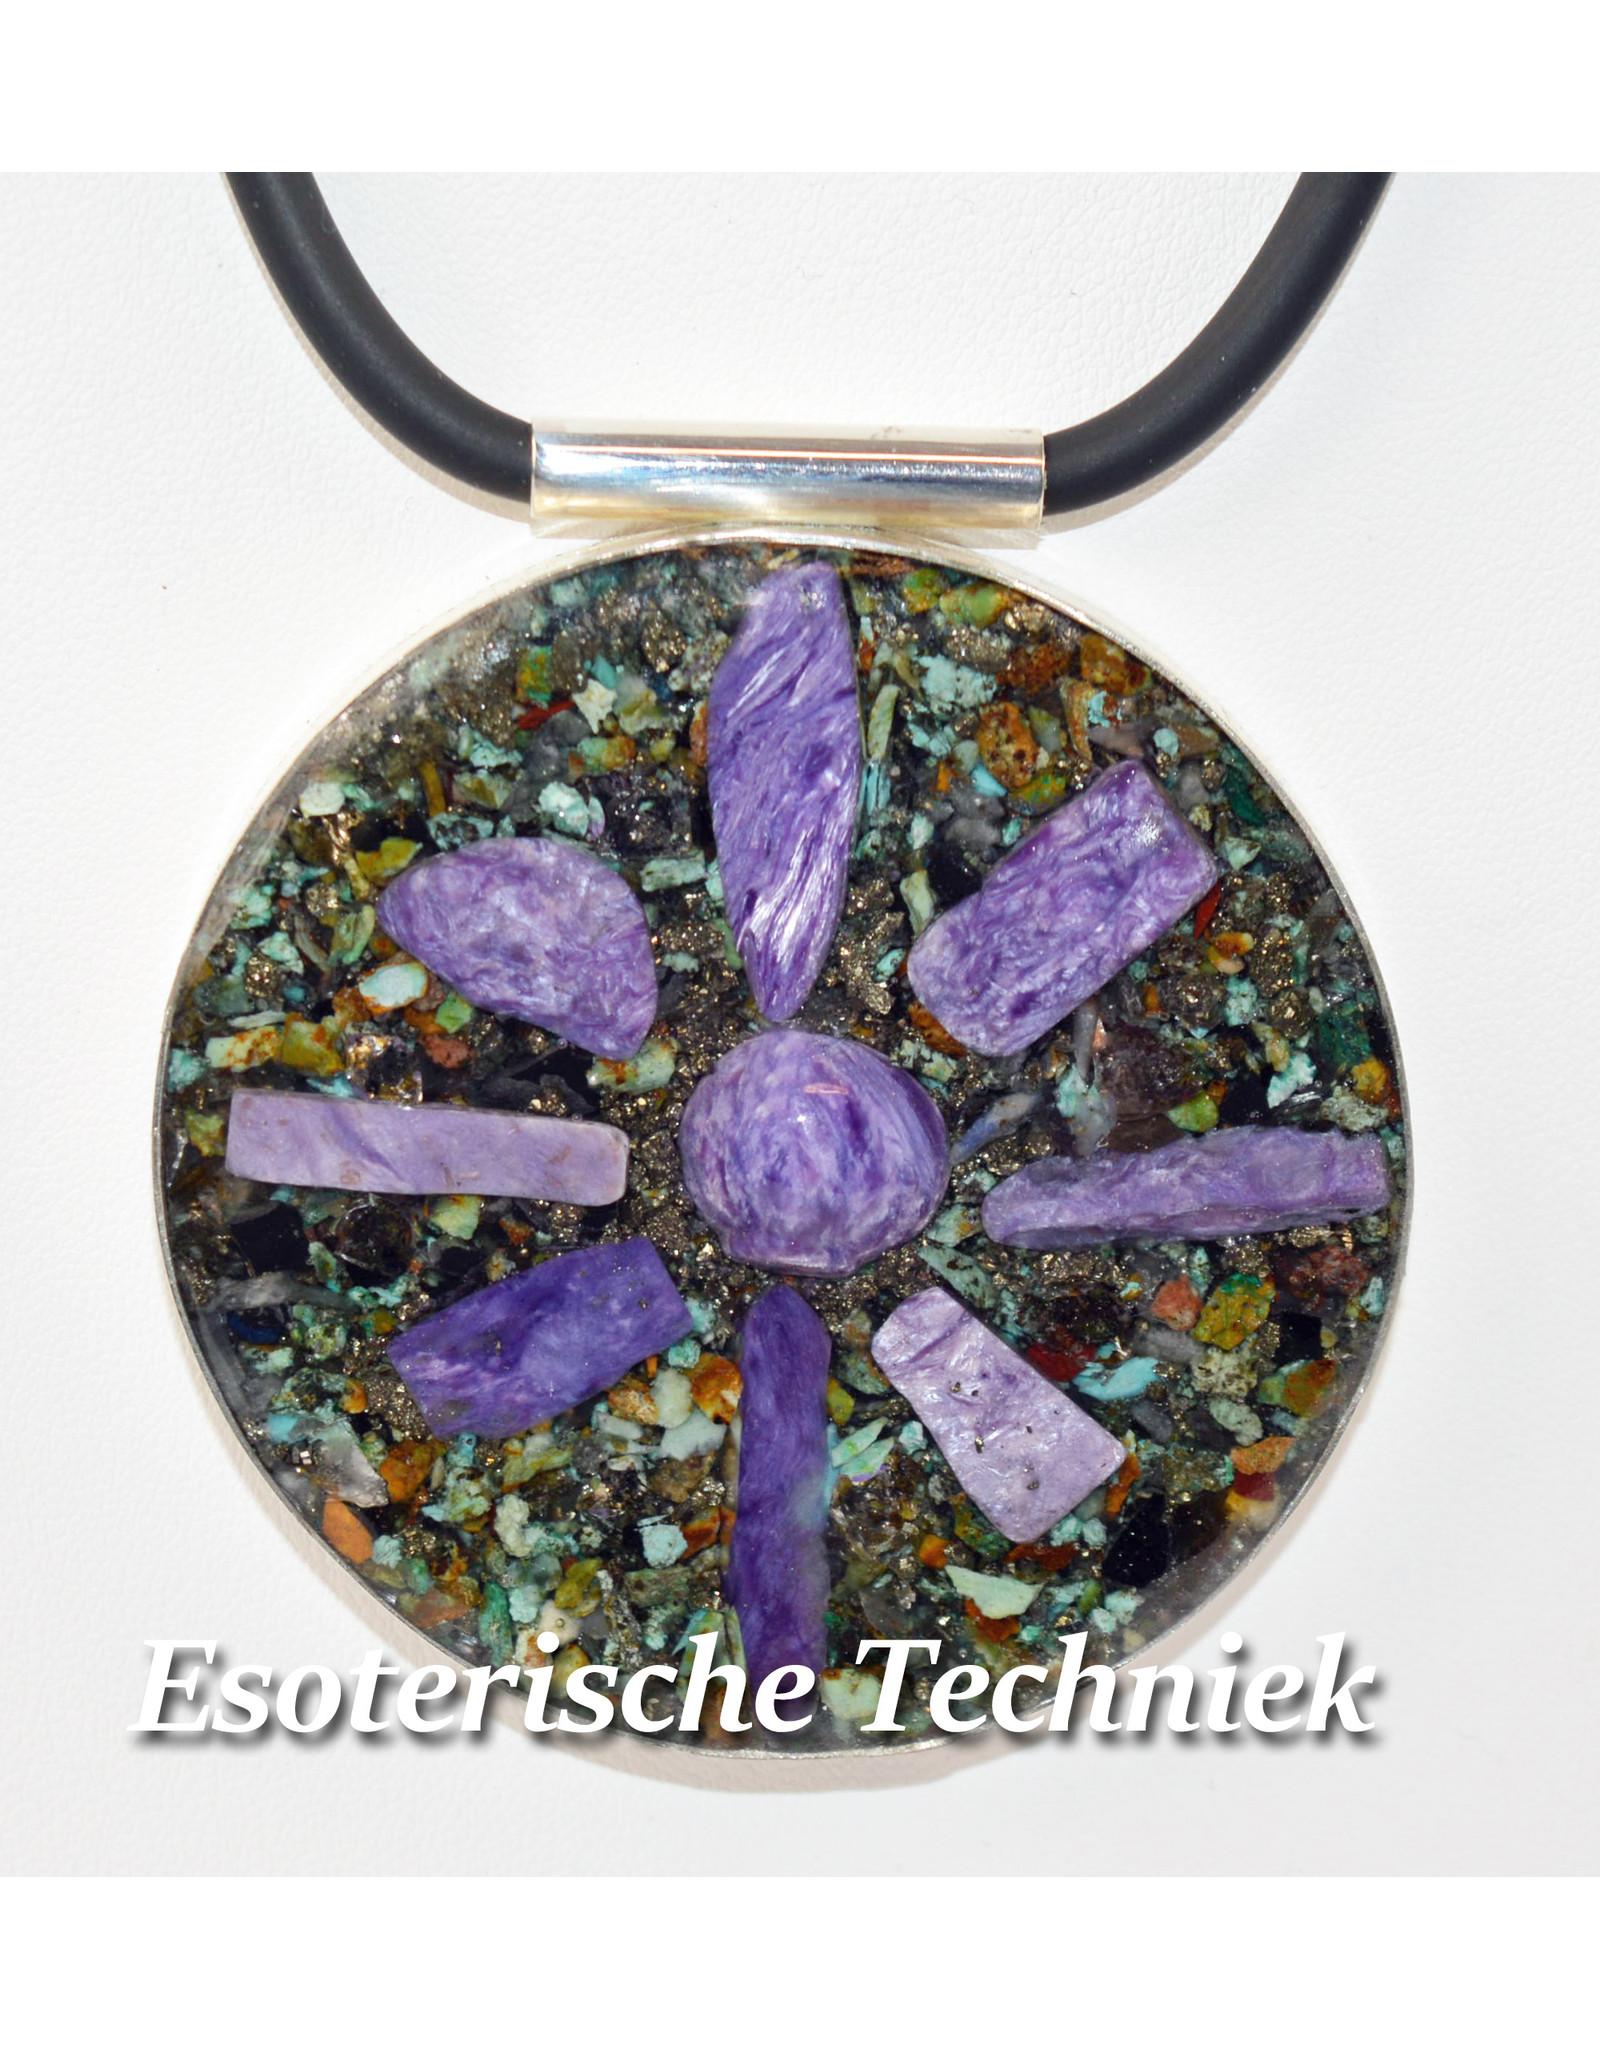 Orgonite sieraad sterling zilver 925 Amulet/Hanger Charoiet, Turkoois, Pyriet, Shungite, Herkimers